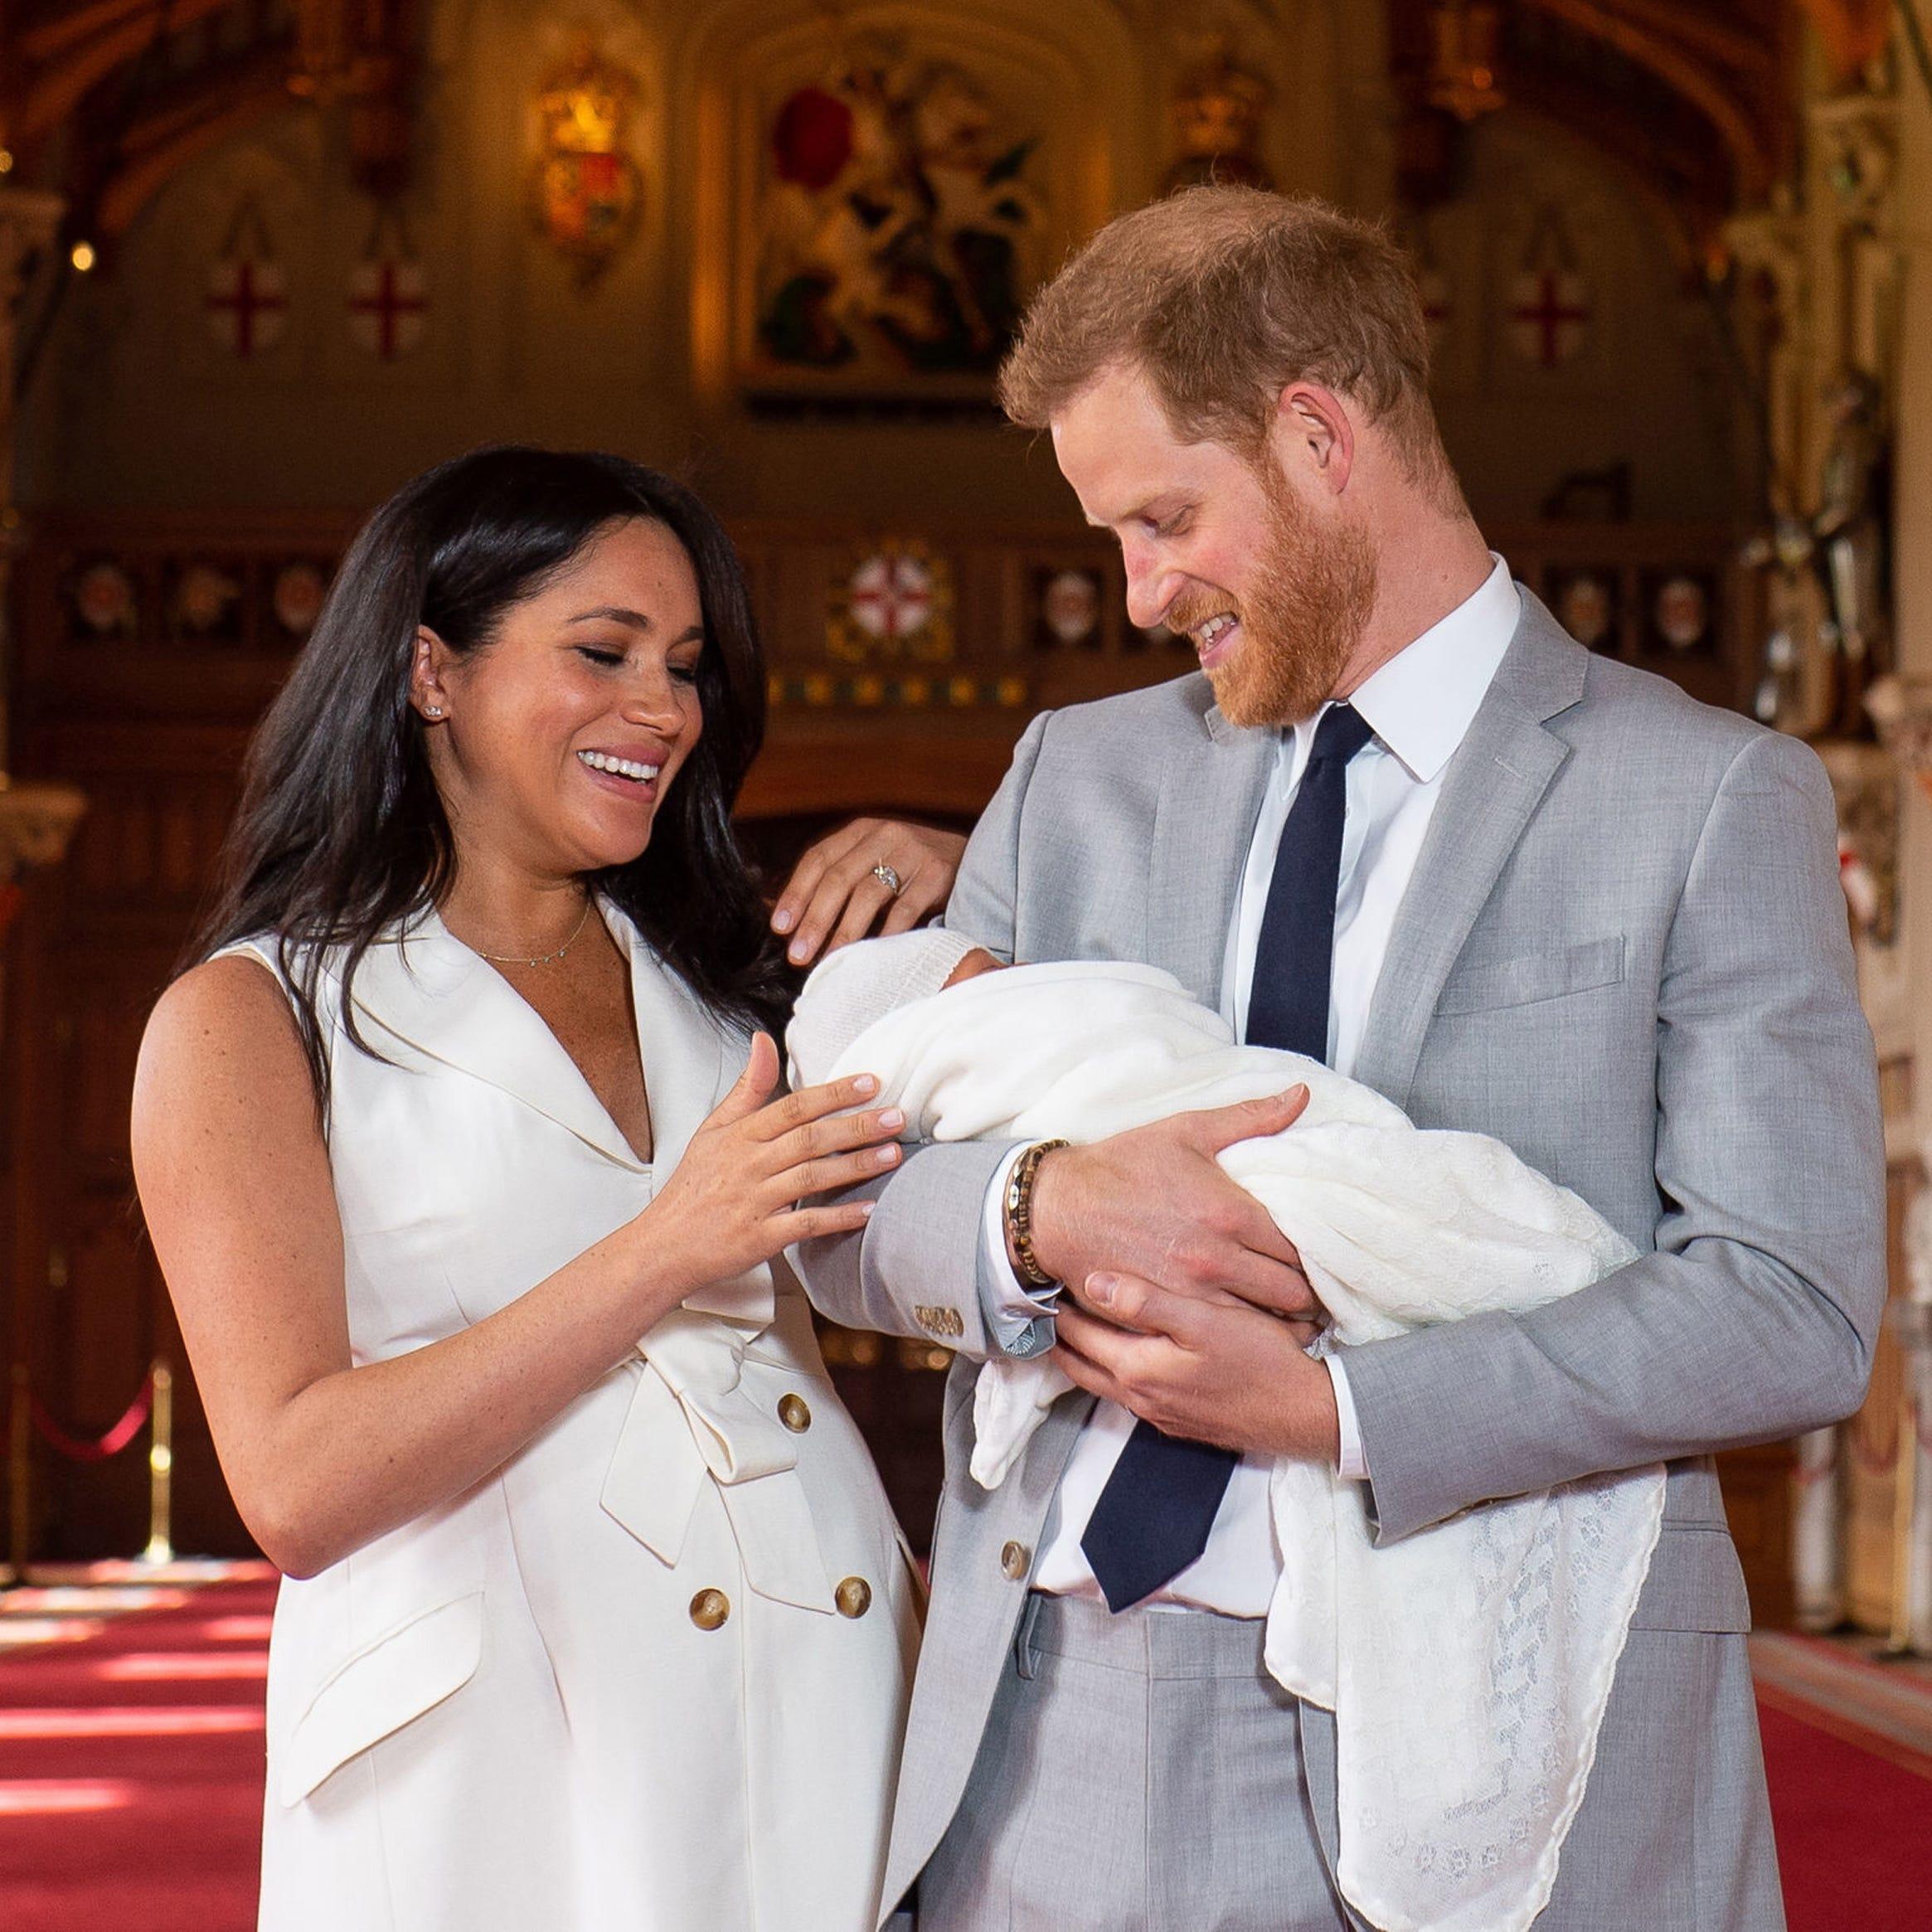 Prince William, Kate visit royal baby Archie, Prince Charles to visit this week